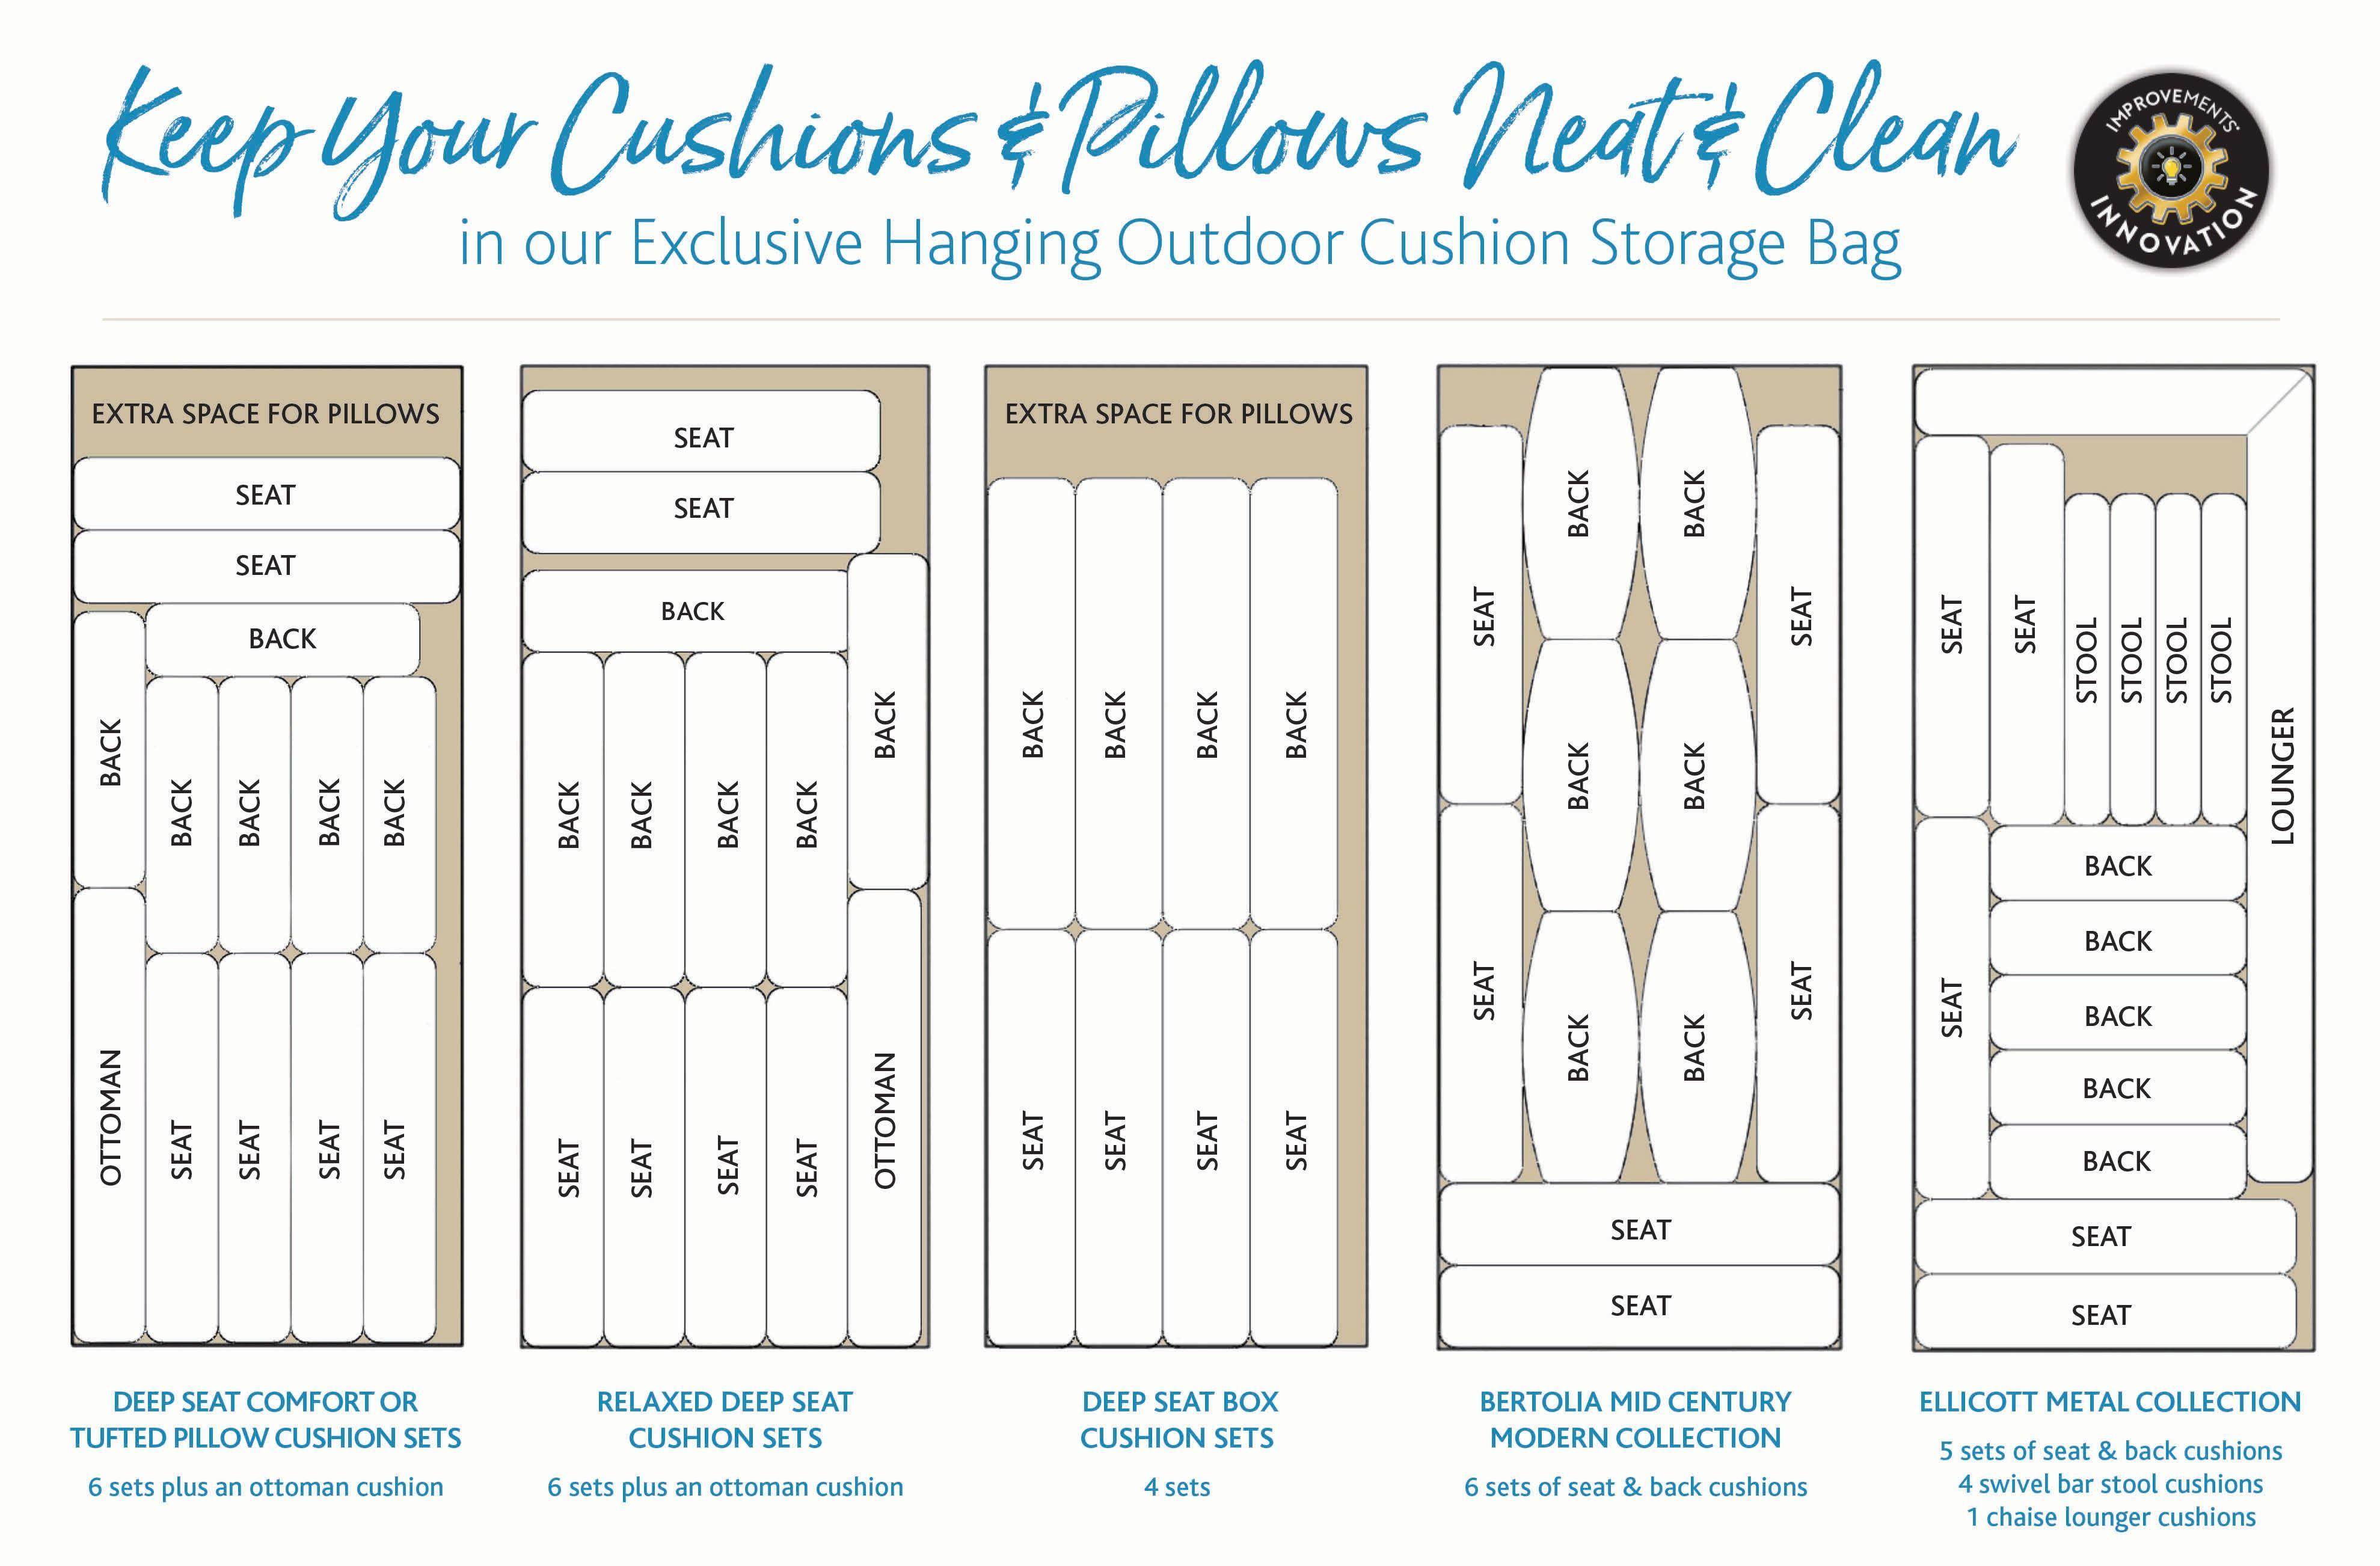 Hanging Outdoor Cushion Storage Bag Improvements Outdoor